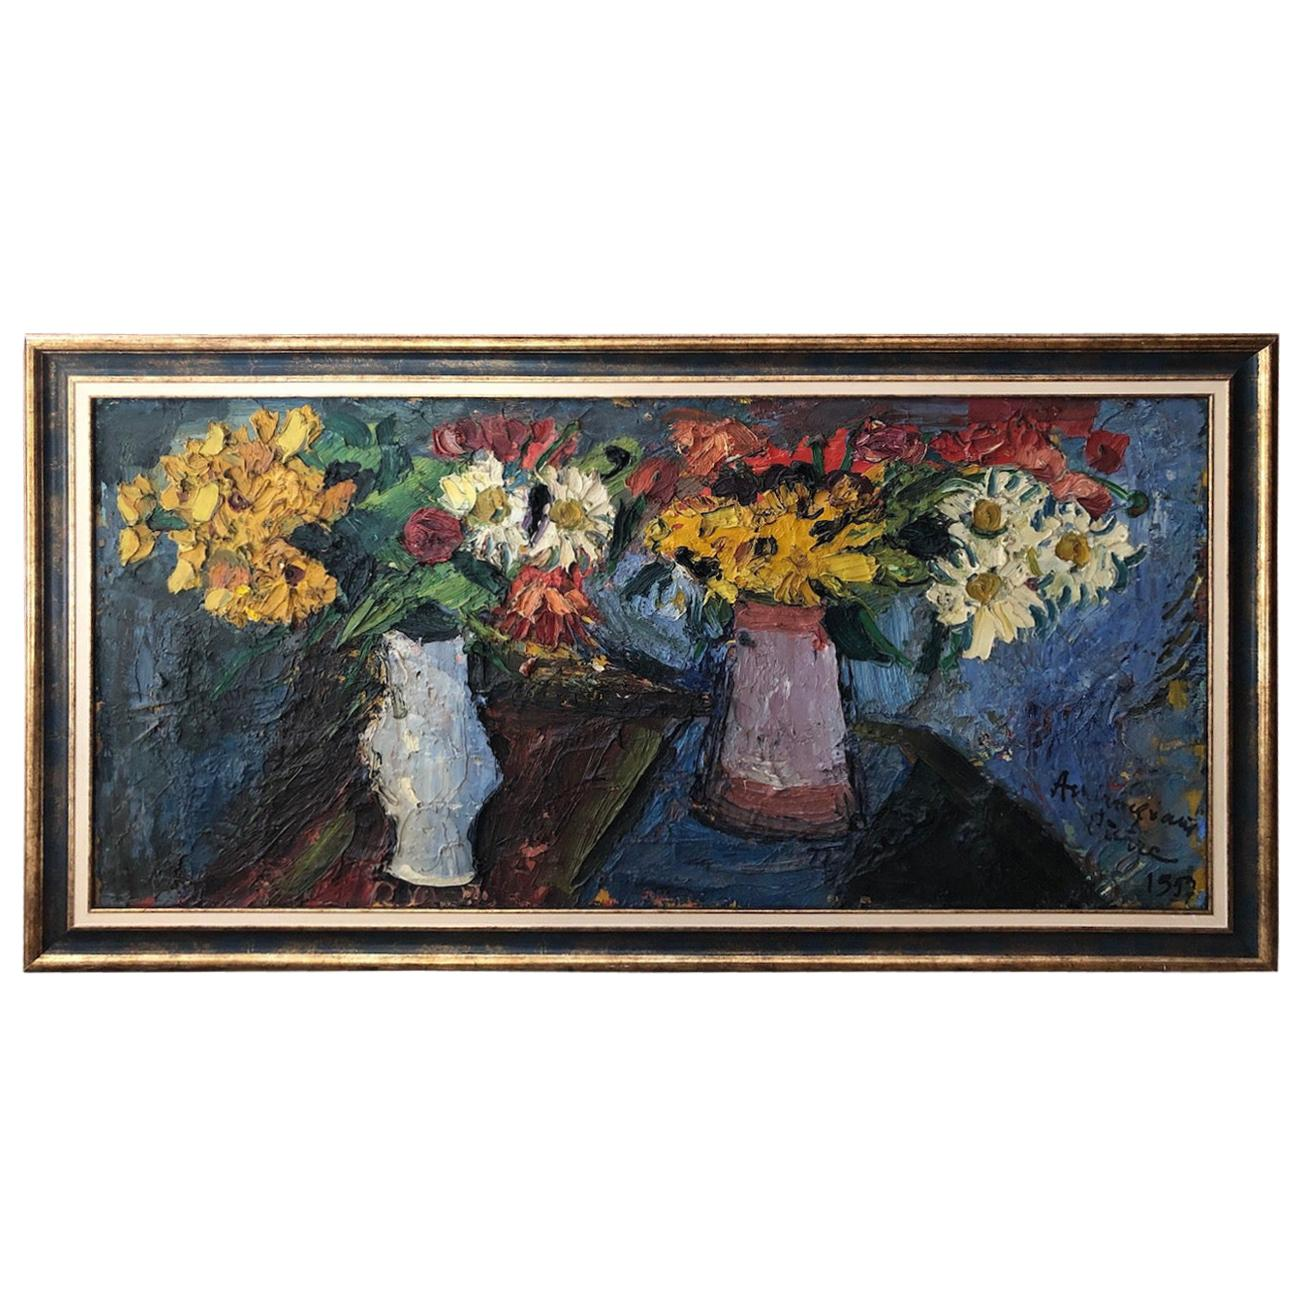 "Pierre Ambrogiani '1907-1985' ""Bouquets of Flowers"", 1957"